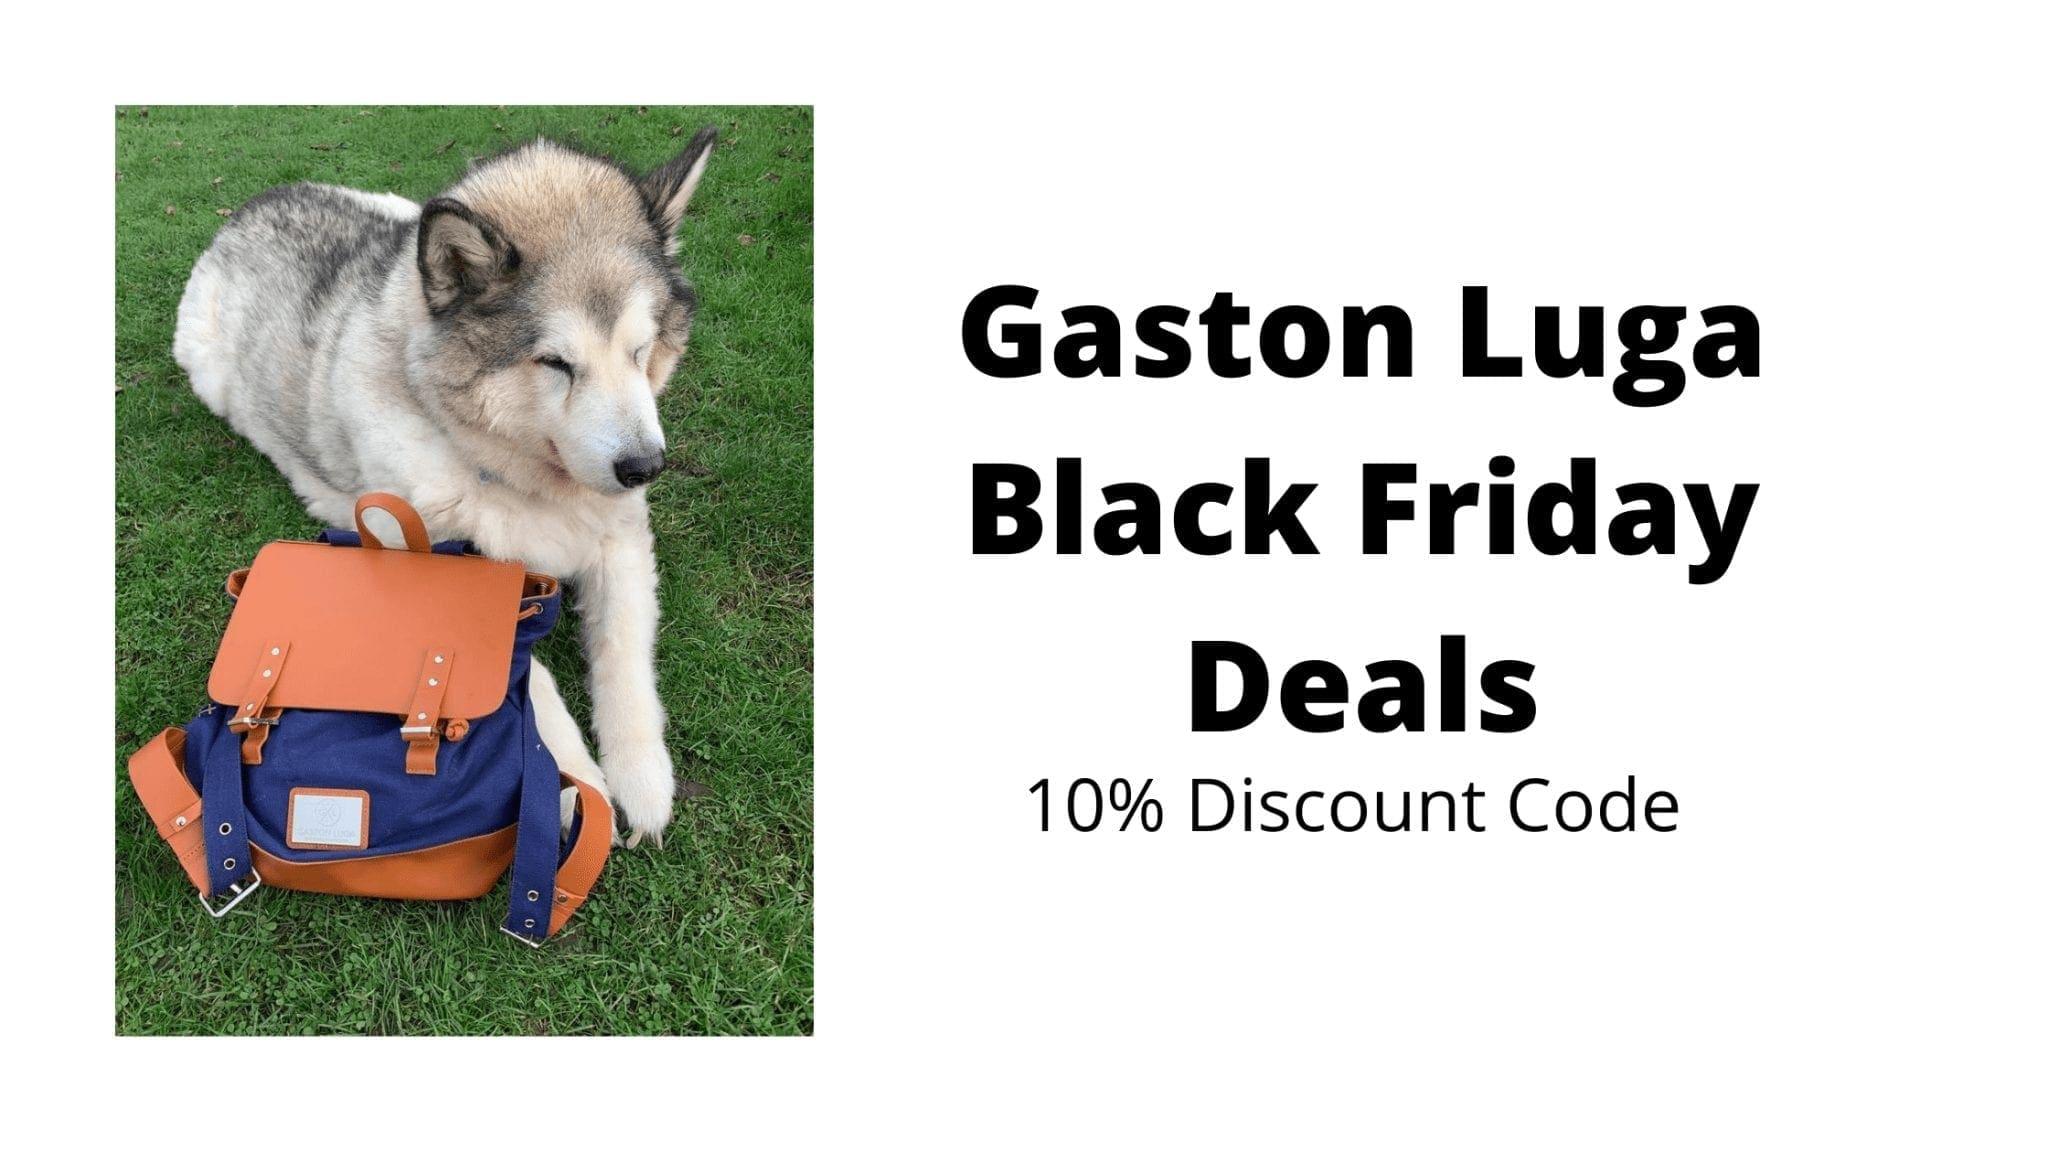 Gaston Luga Black Friday Deals